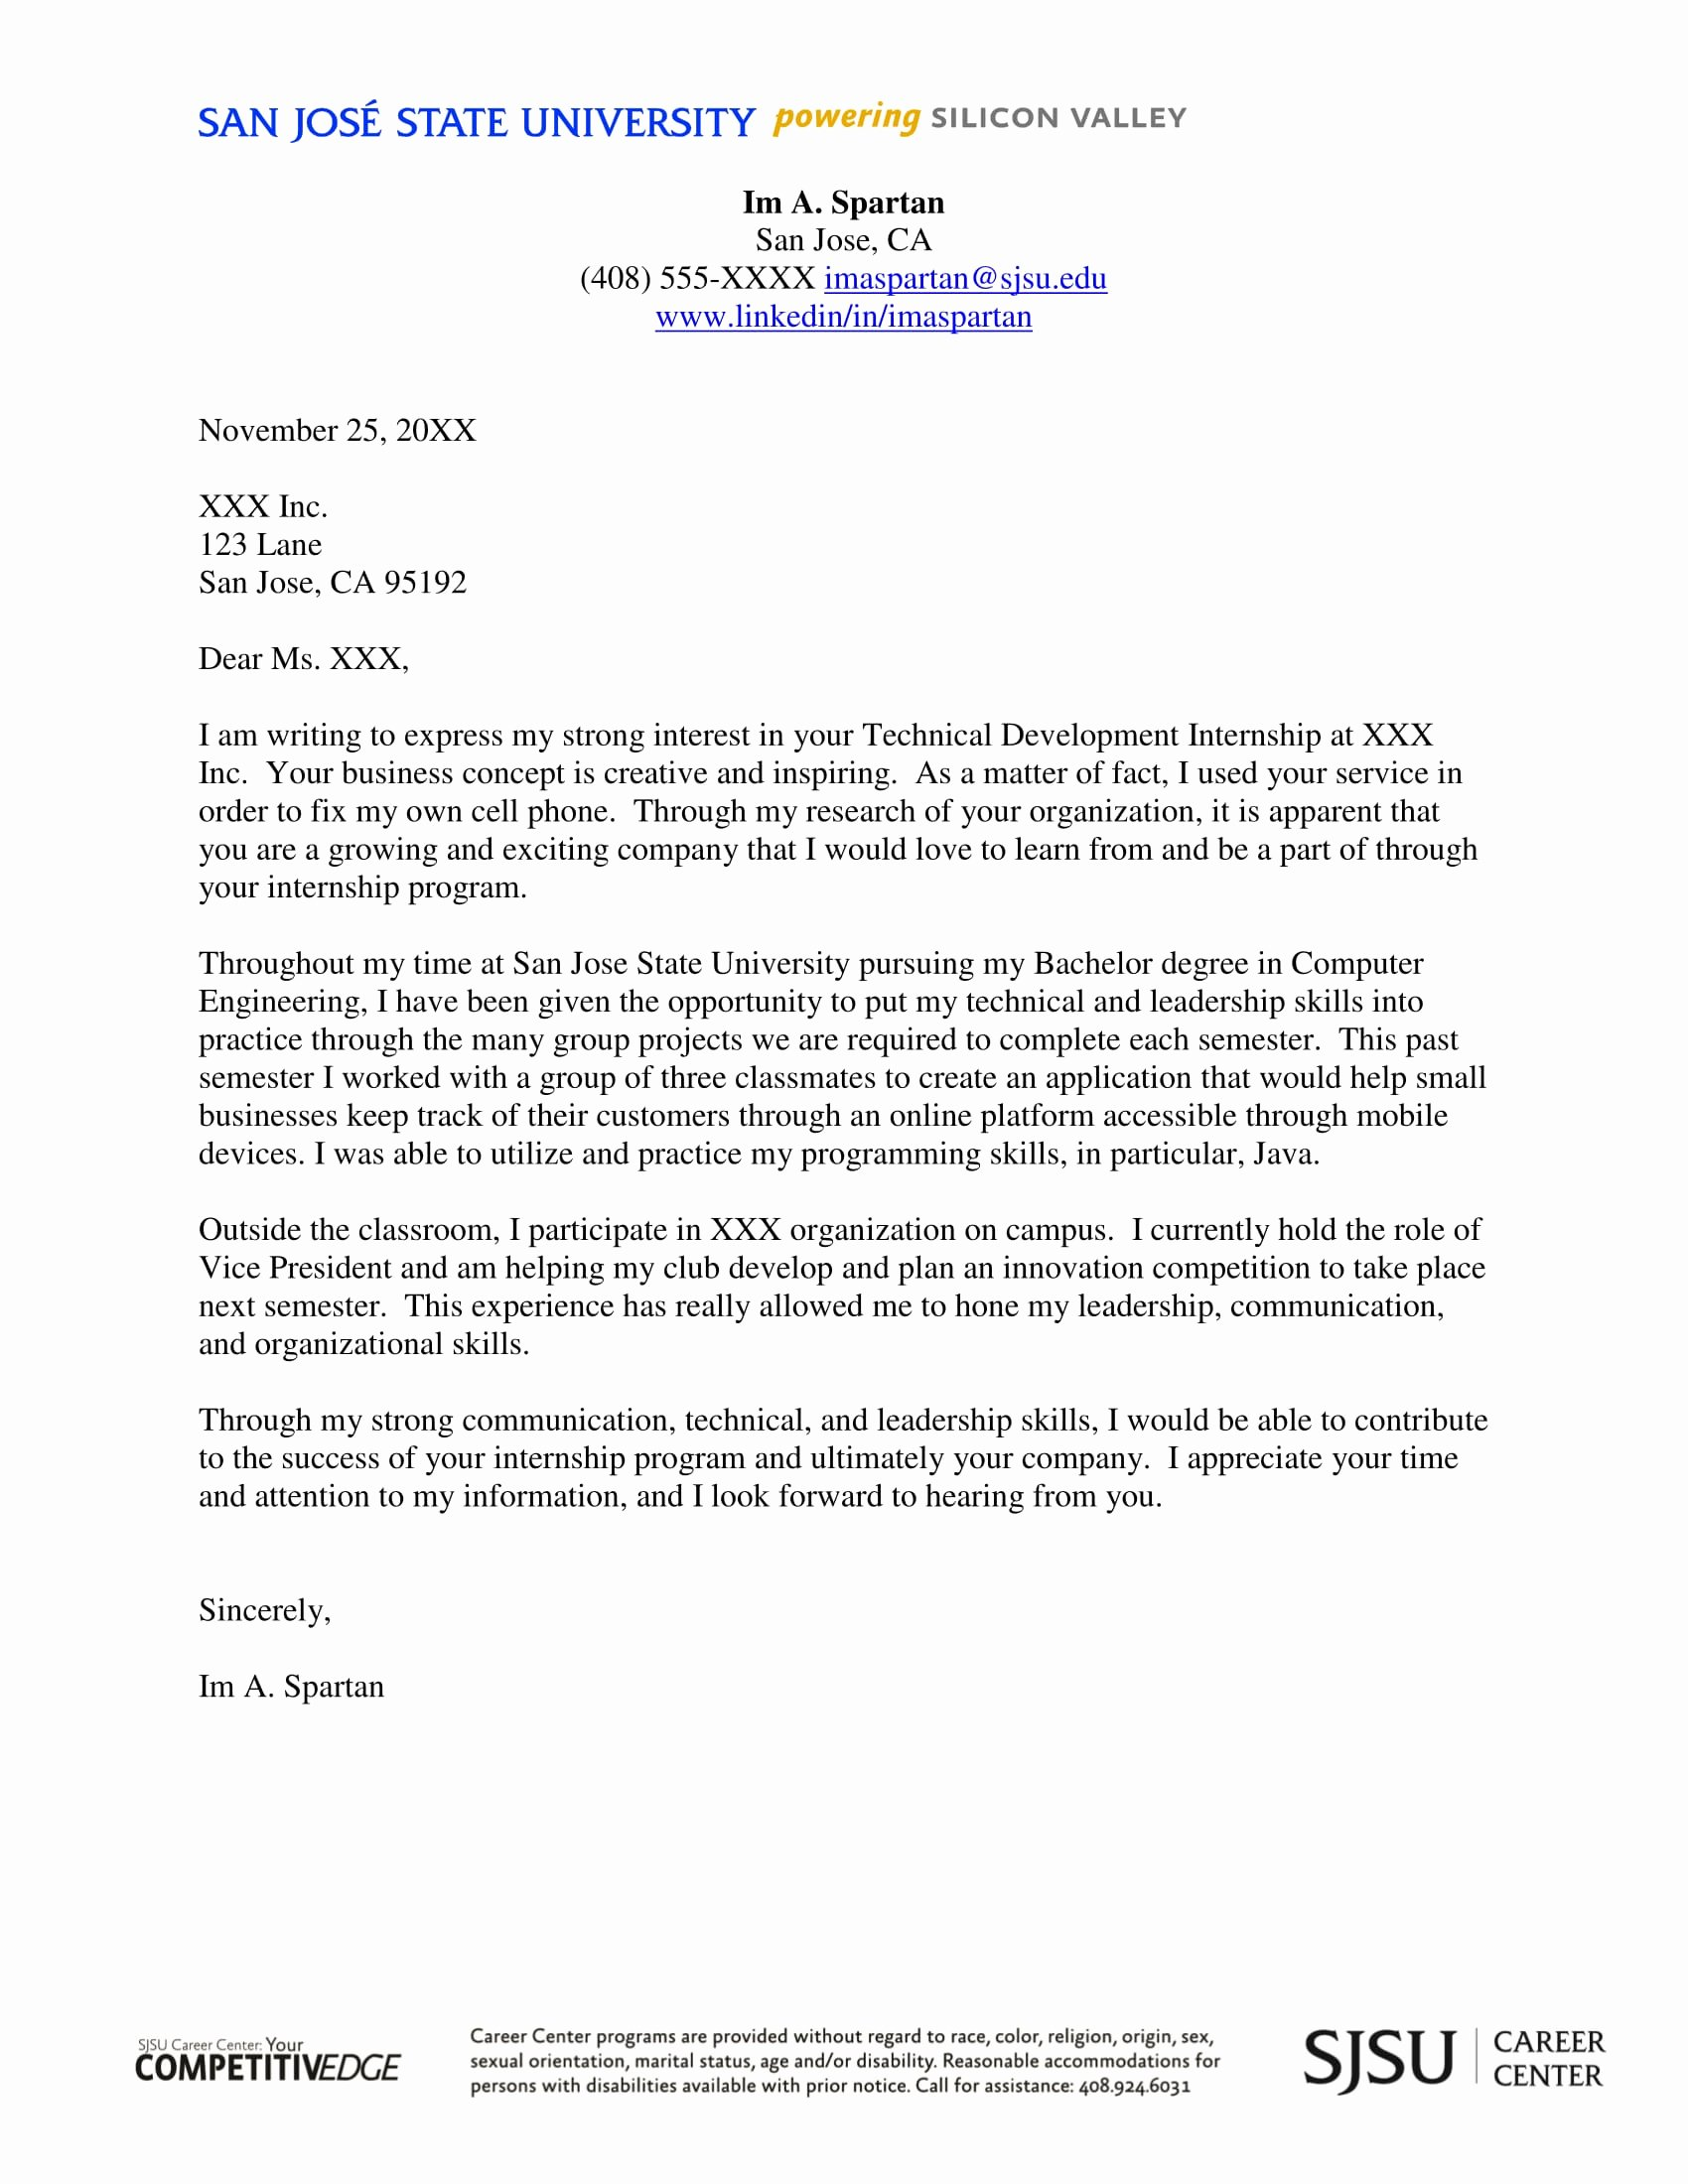 Cover Letter Template for Internship Unique 16 Best Cover Letter Samples for Internship Wisestep